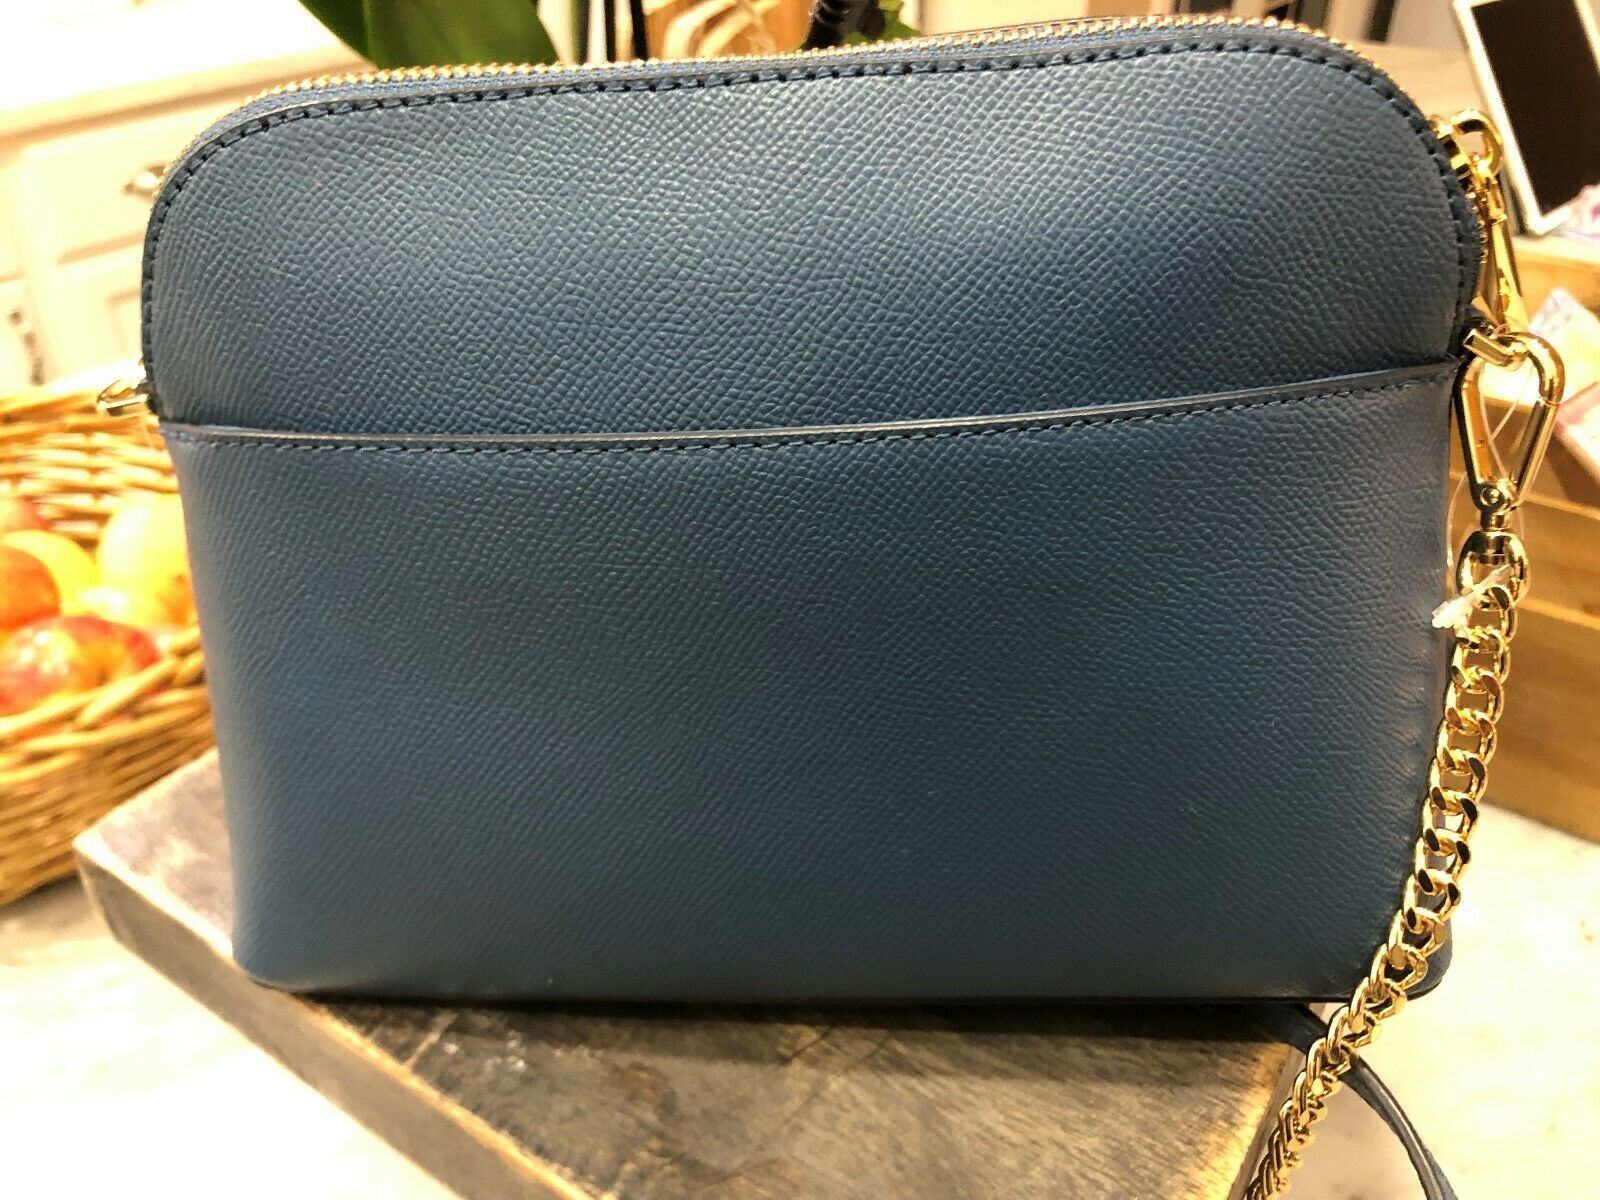 Michael Kors Mott Cindy Large Zip Dome Crossbody Bag Crossgrain Leather Chambray image 6